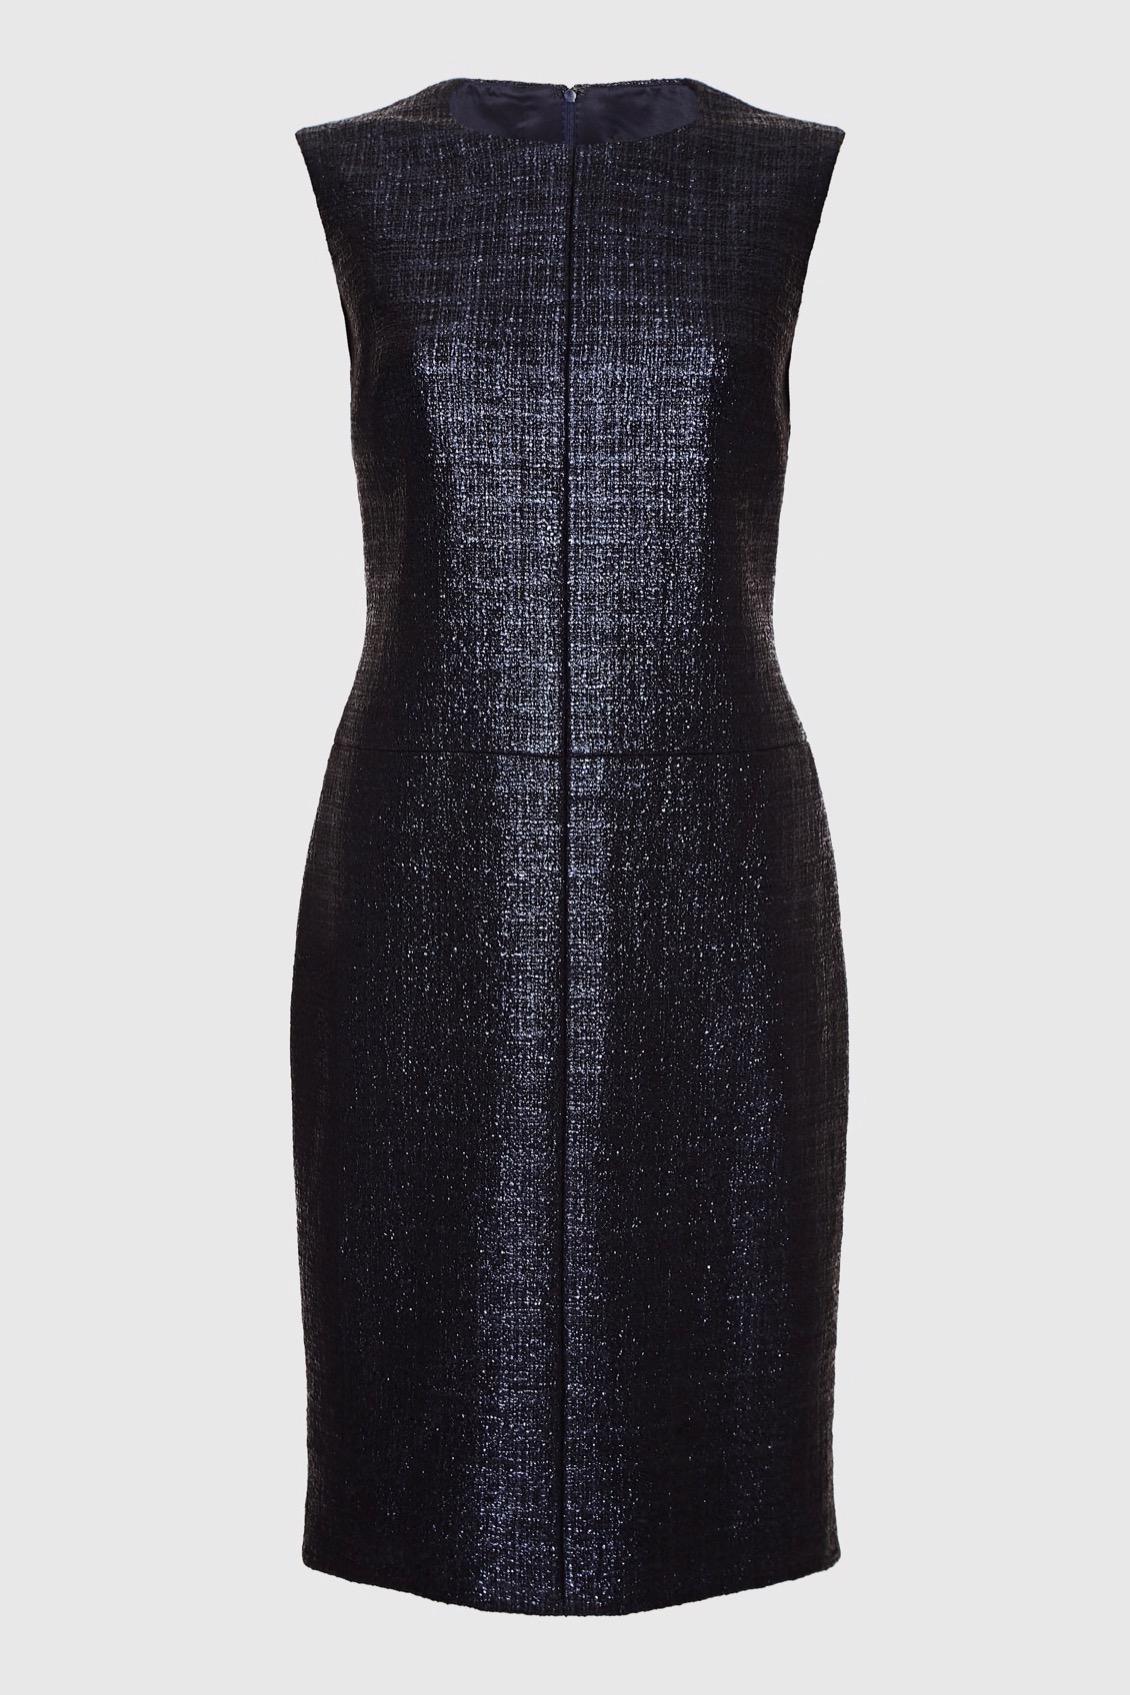 hopsack dress_F